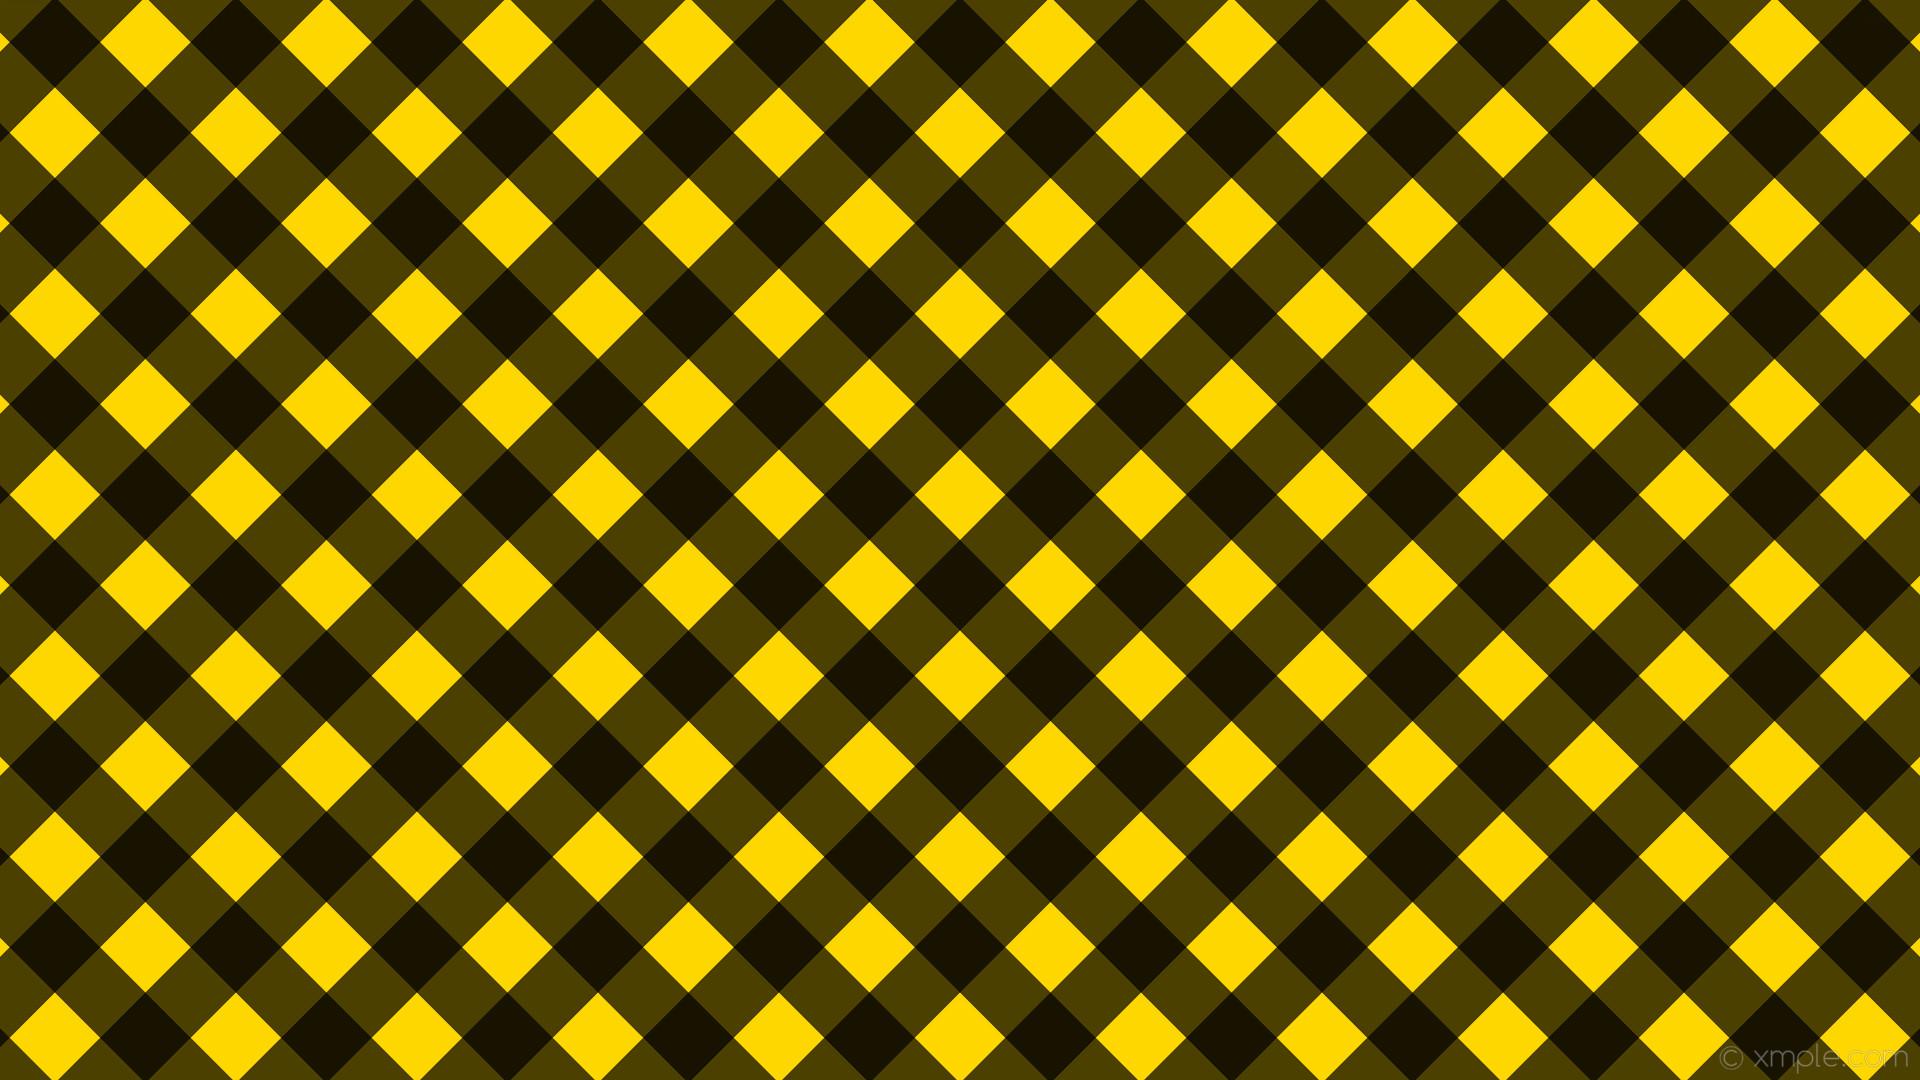 wallpaper gingham striped checker black yellow gold #ffd700 #000000 315°  64px